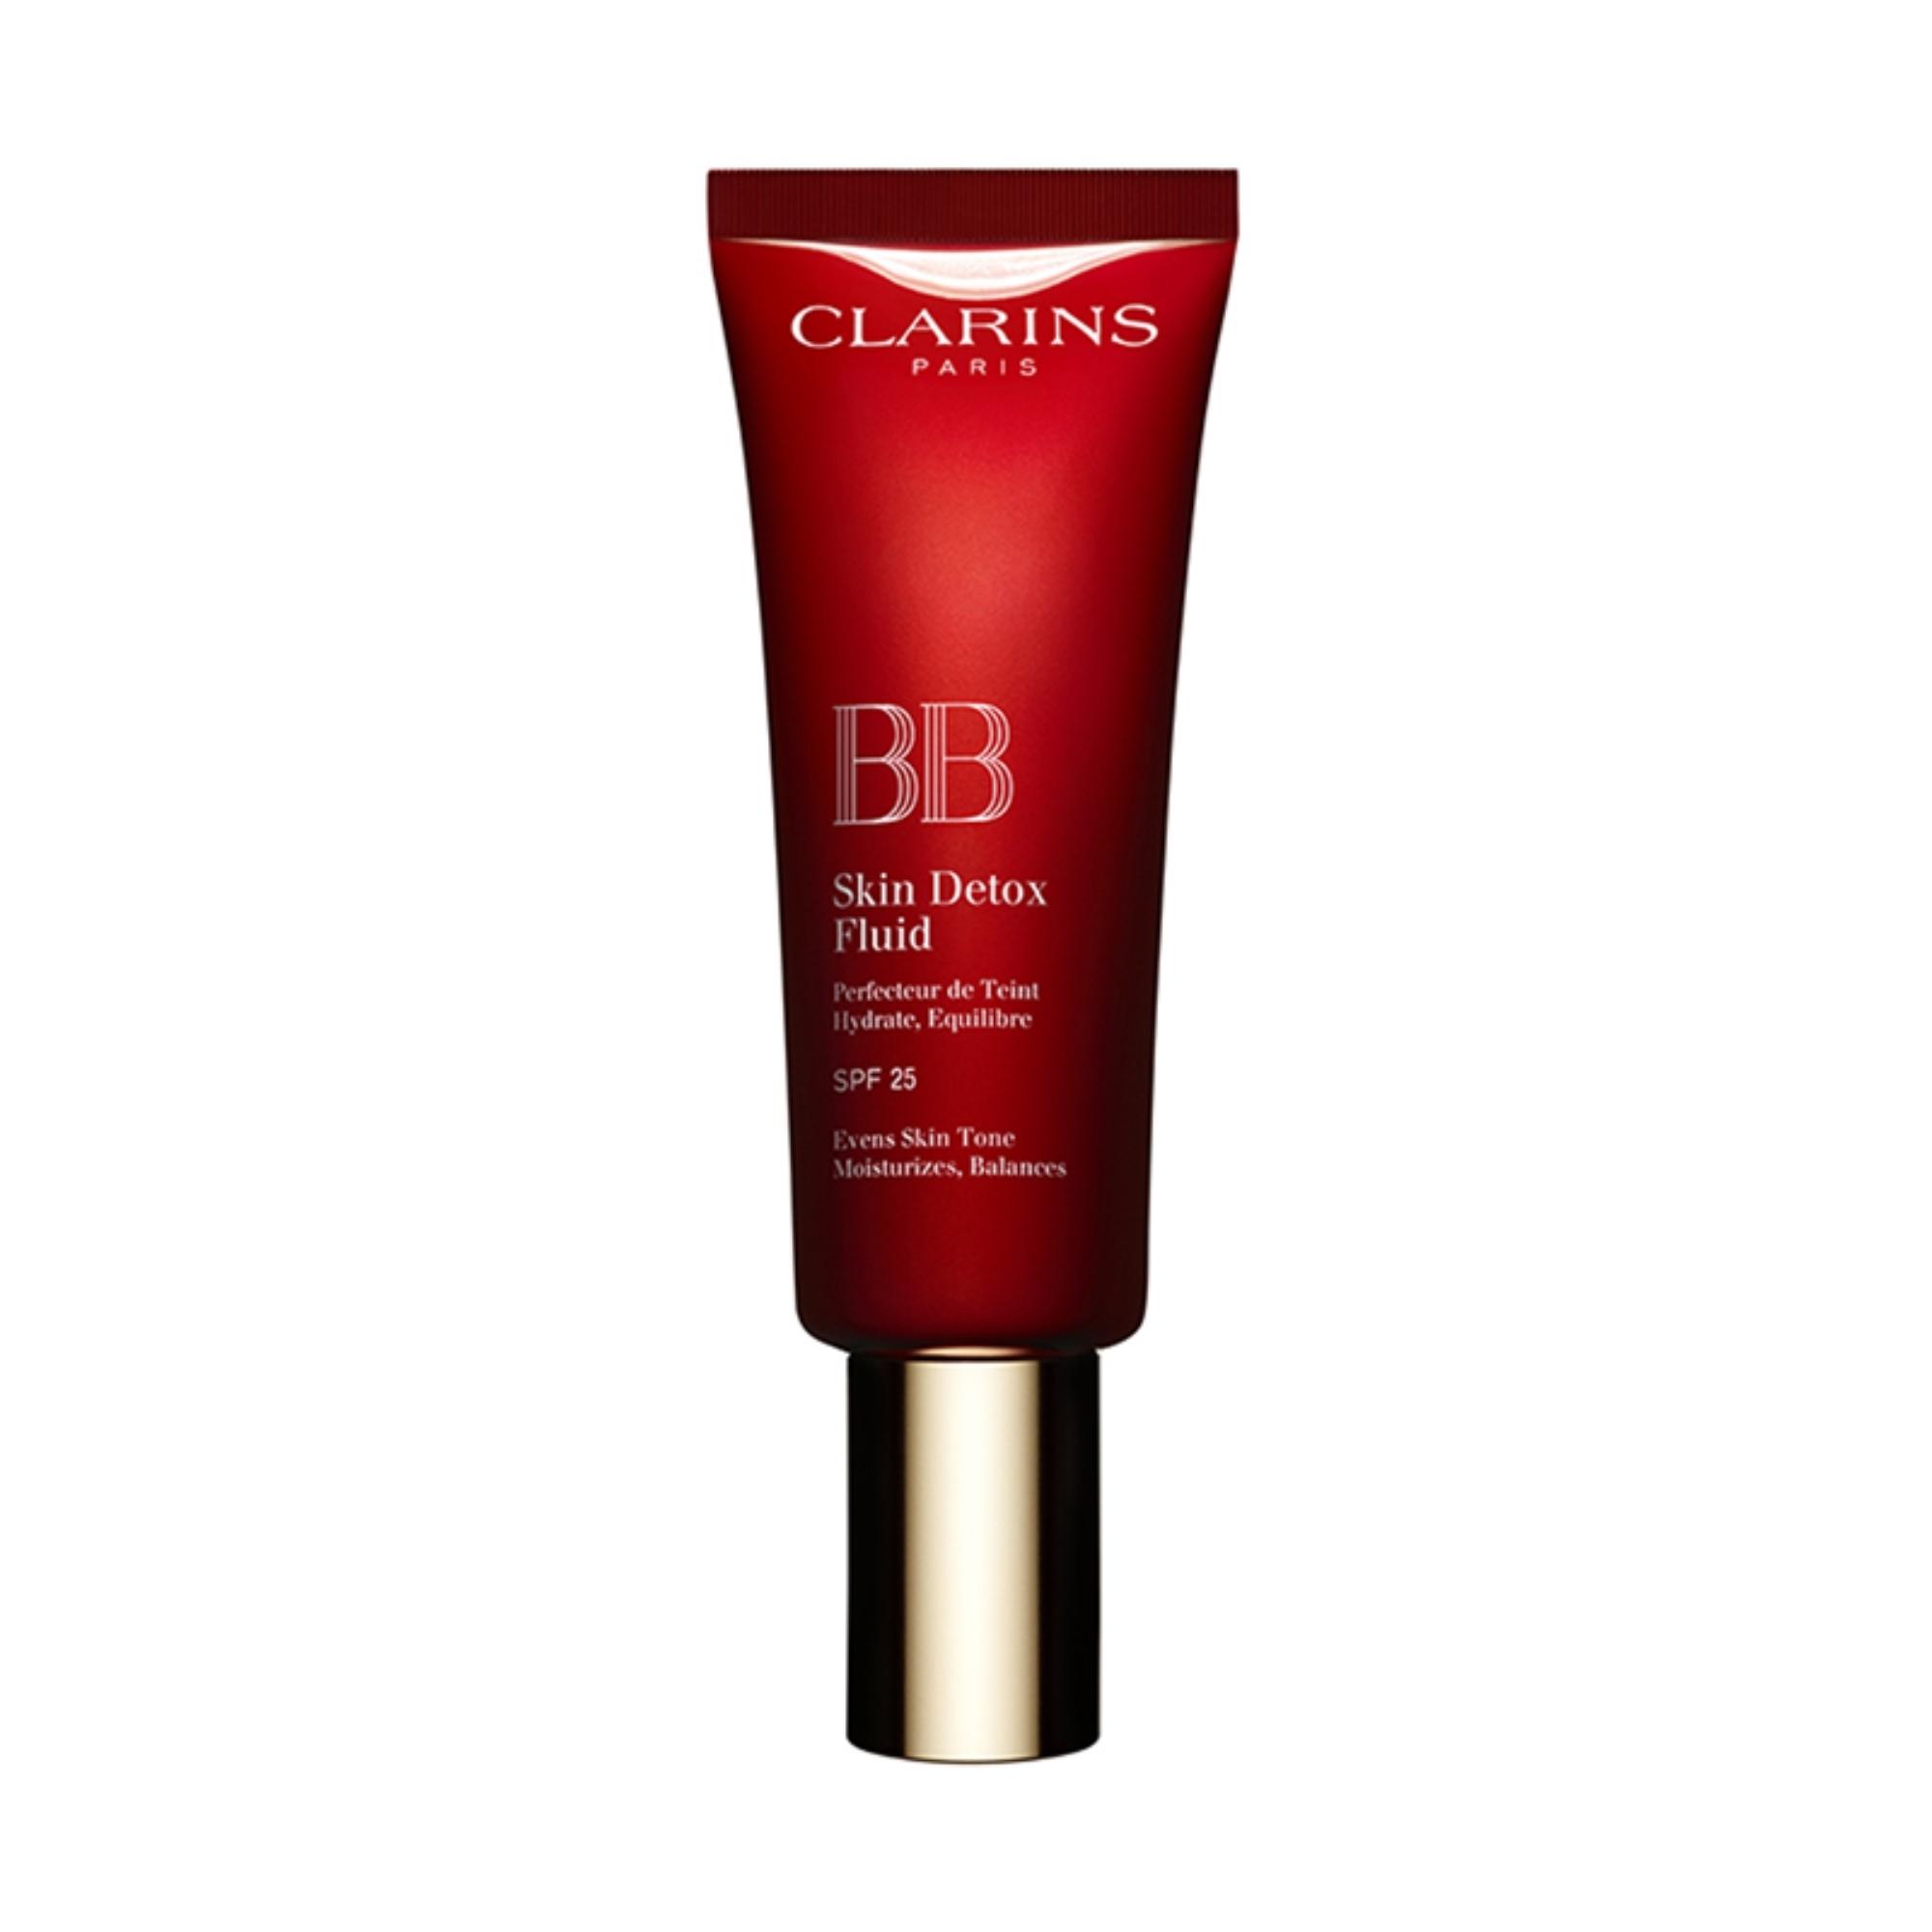 BB Skin Detox Fluid foundation